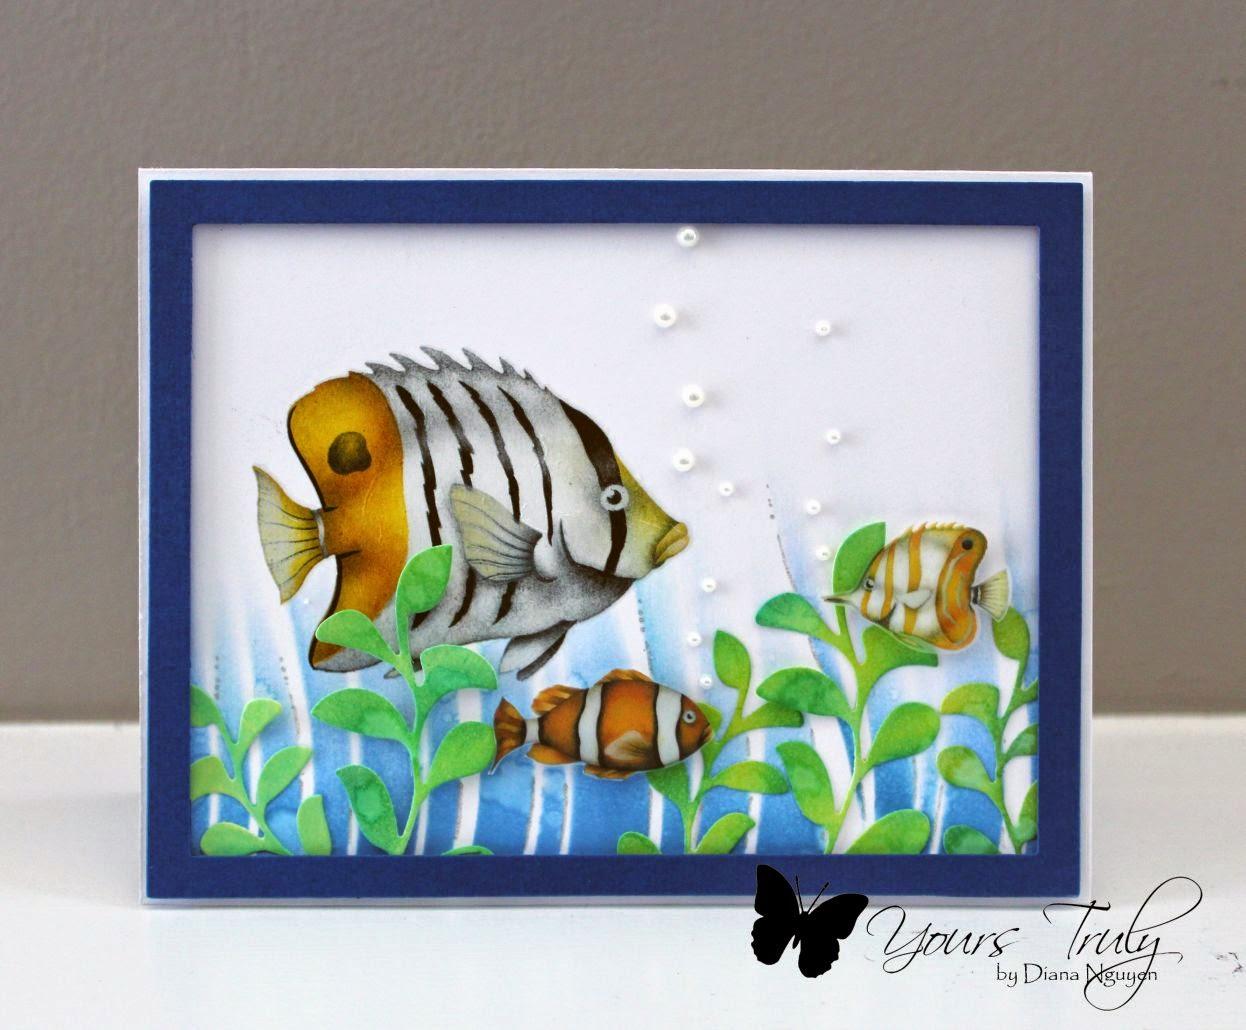 Diana Nguyen, fish, card